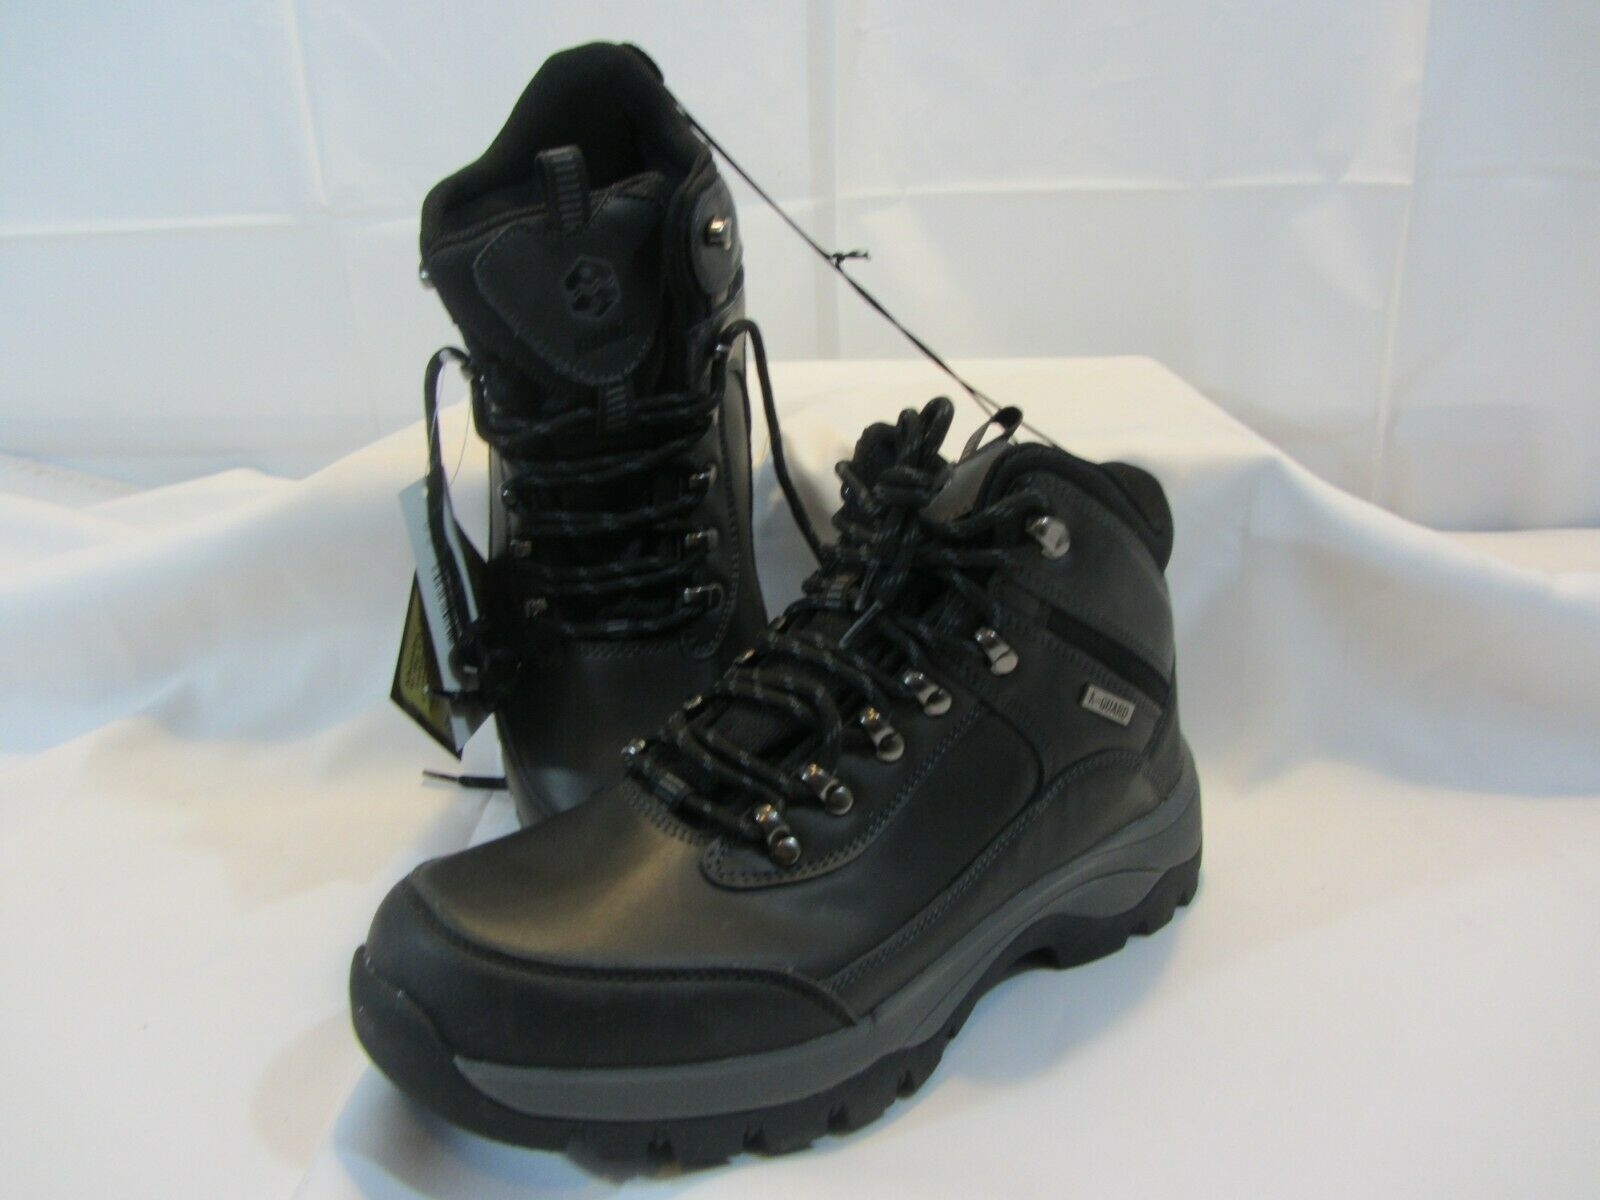 Khombu Men/'s Boots USA Ski Team Size 12-New With Box Grey